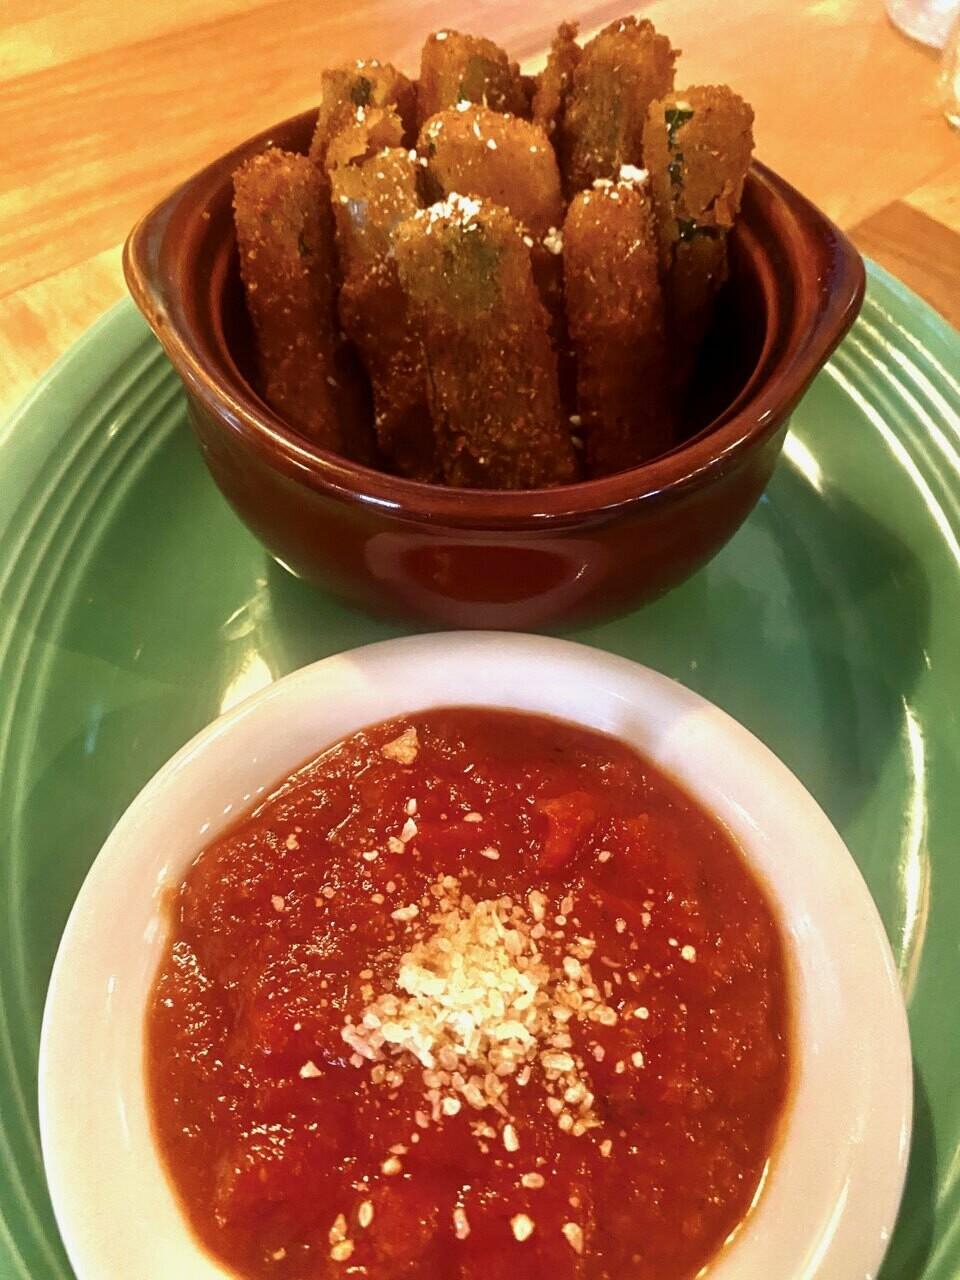 Fried Zucchini Fingers